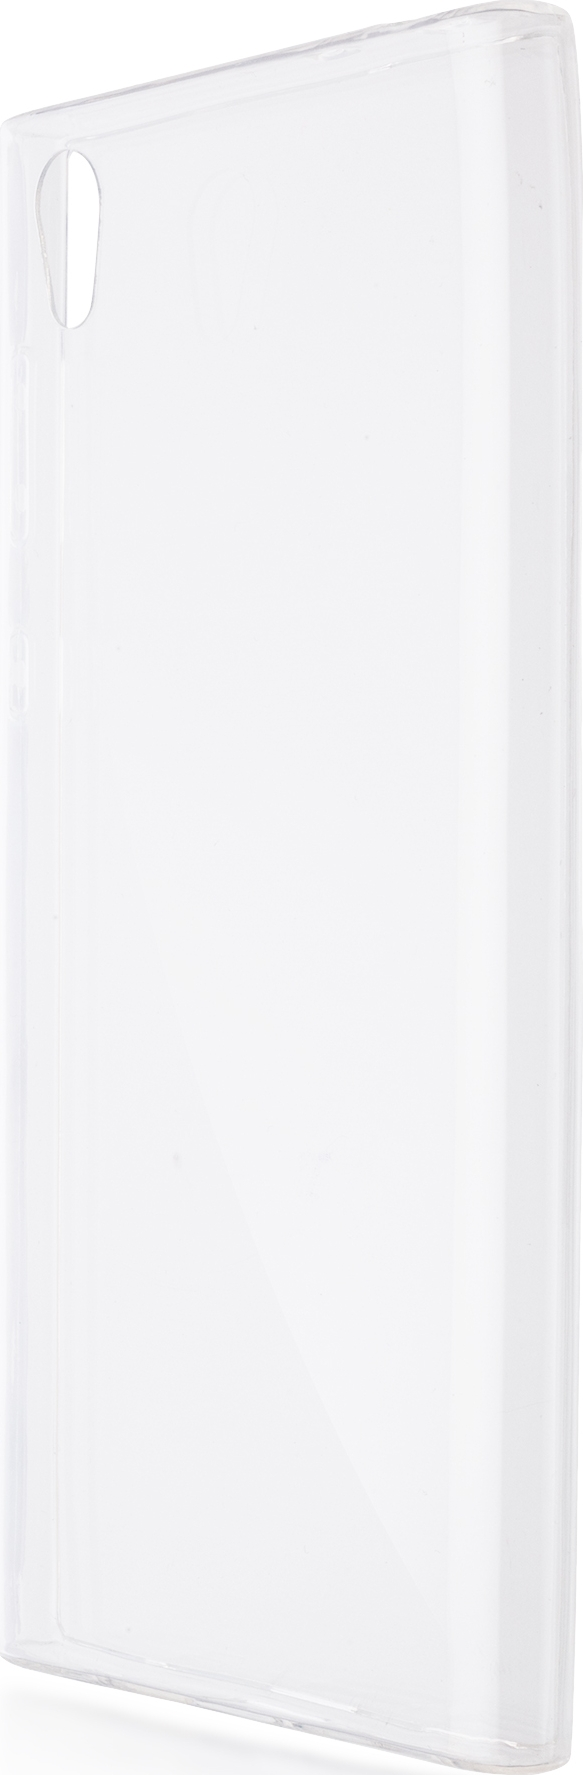 Чехол Brosco TPU для Sony Xperia L1, прозрачный чехол для sony i4213 xperia 10 plus brosco силиконовая накладка черный